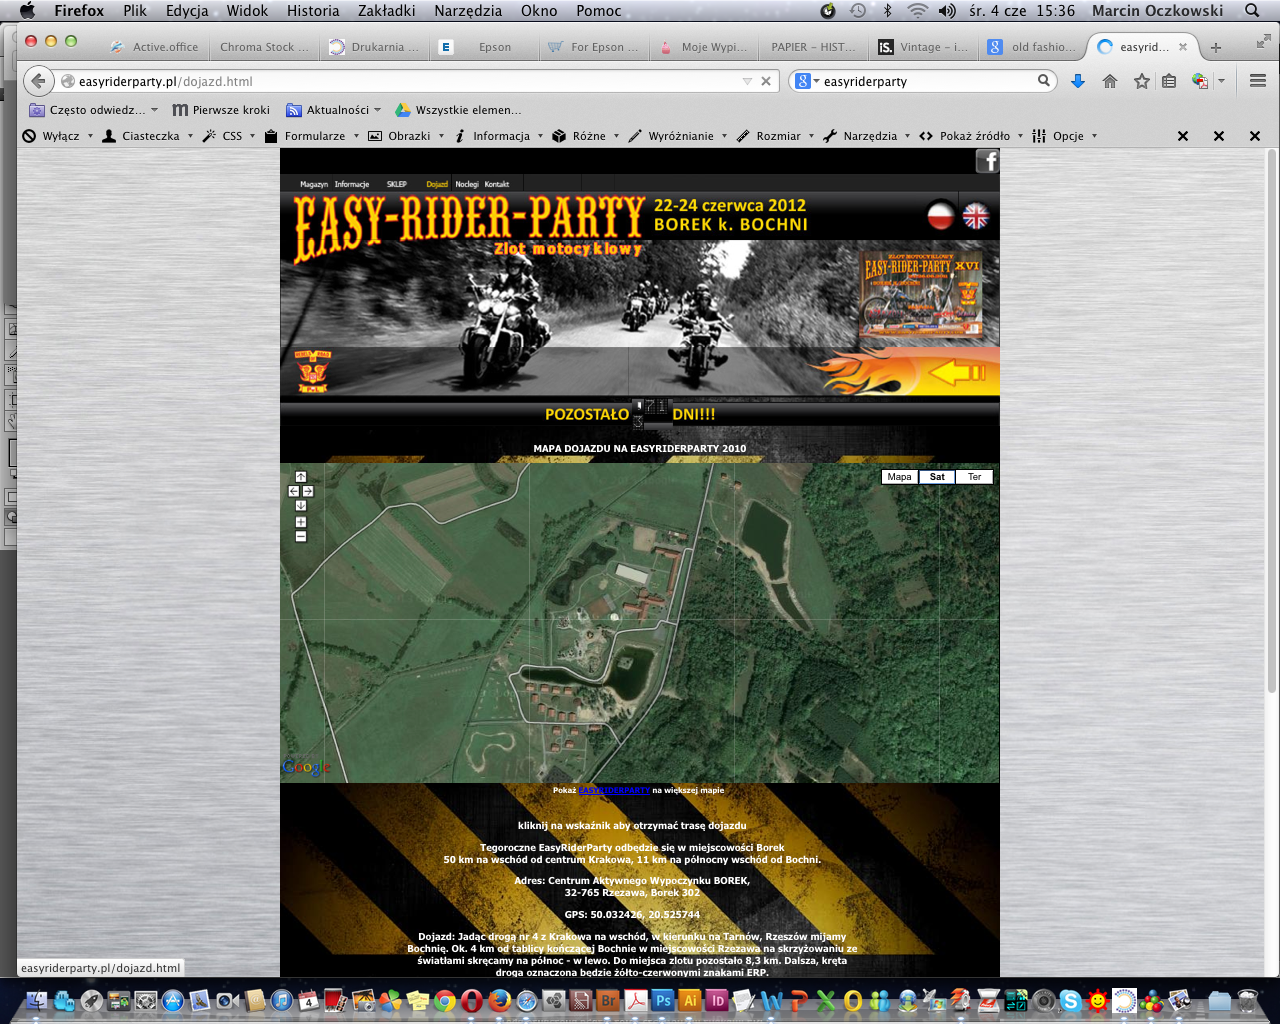 Zrzut ekranu 2014-06-4 o 15.36.55